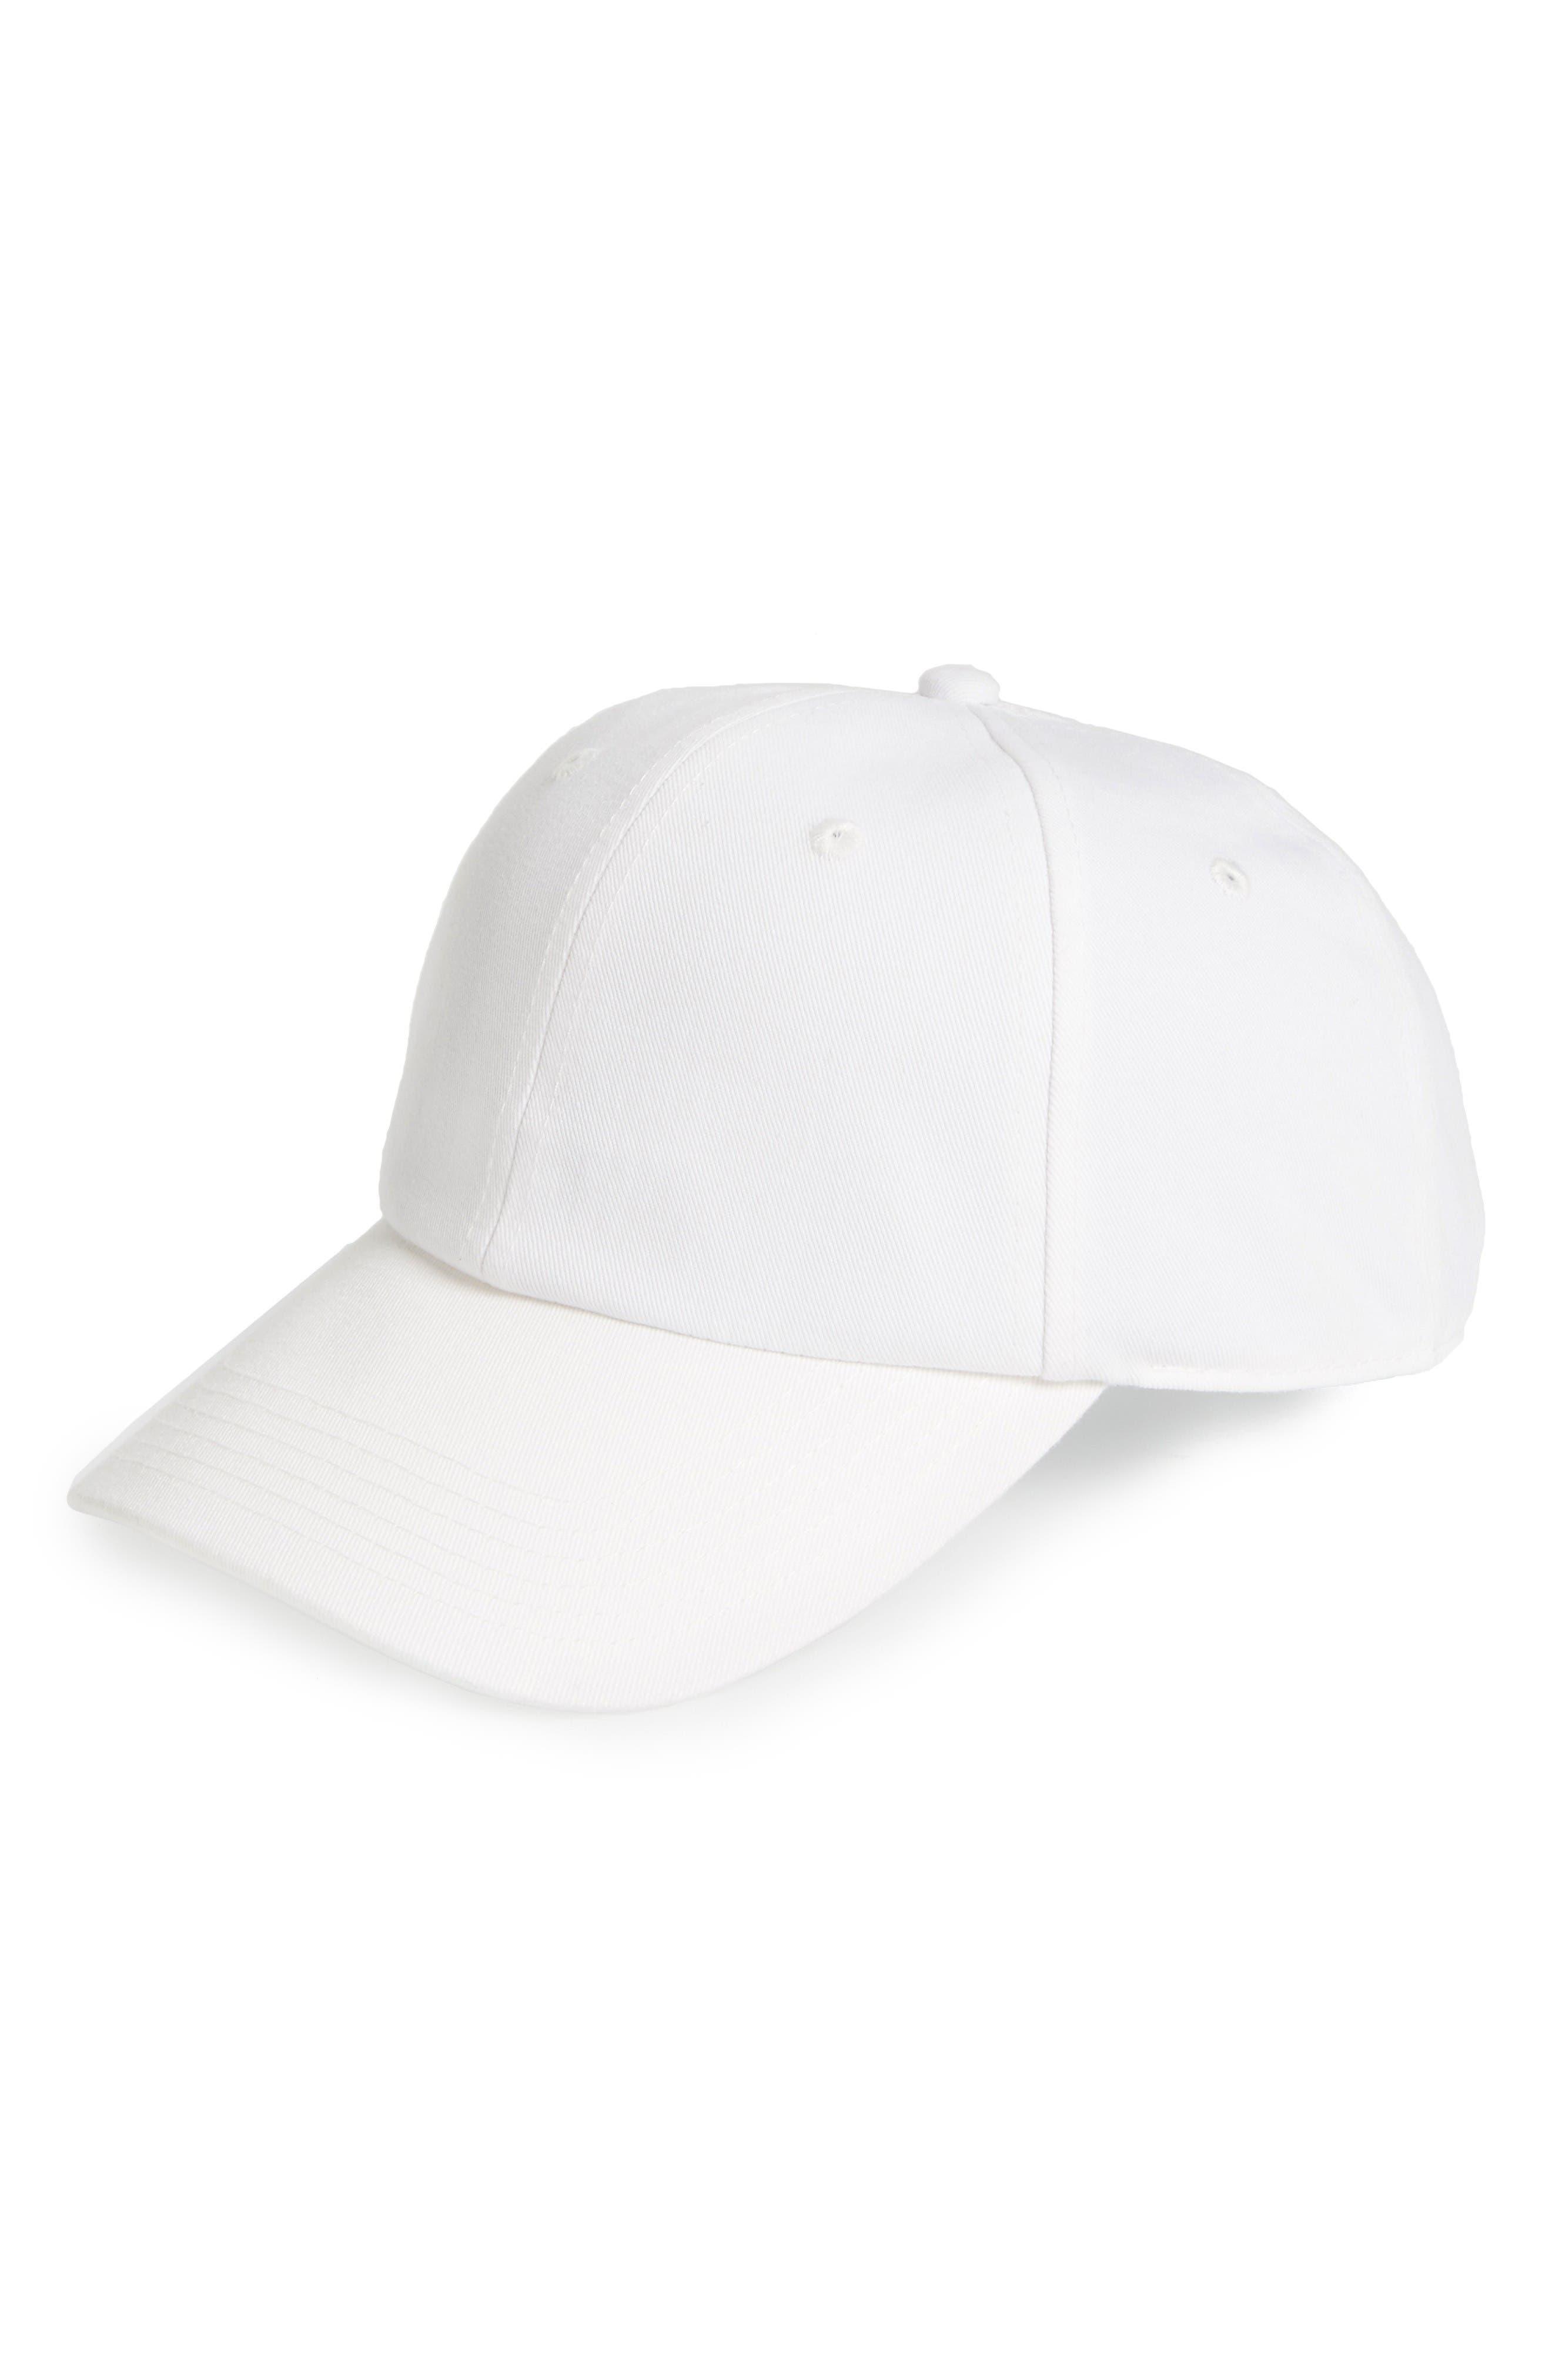 Canvas Baseball Cap,                         Main,                         color, White